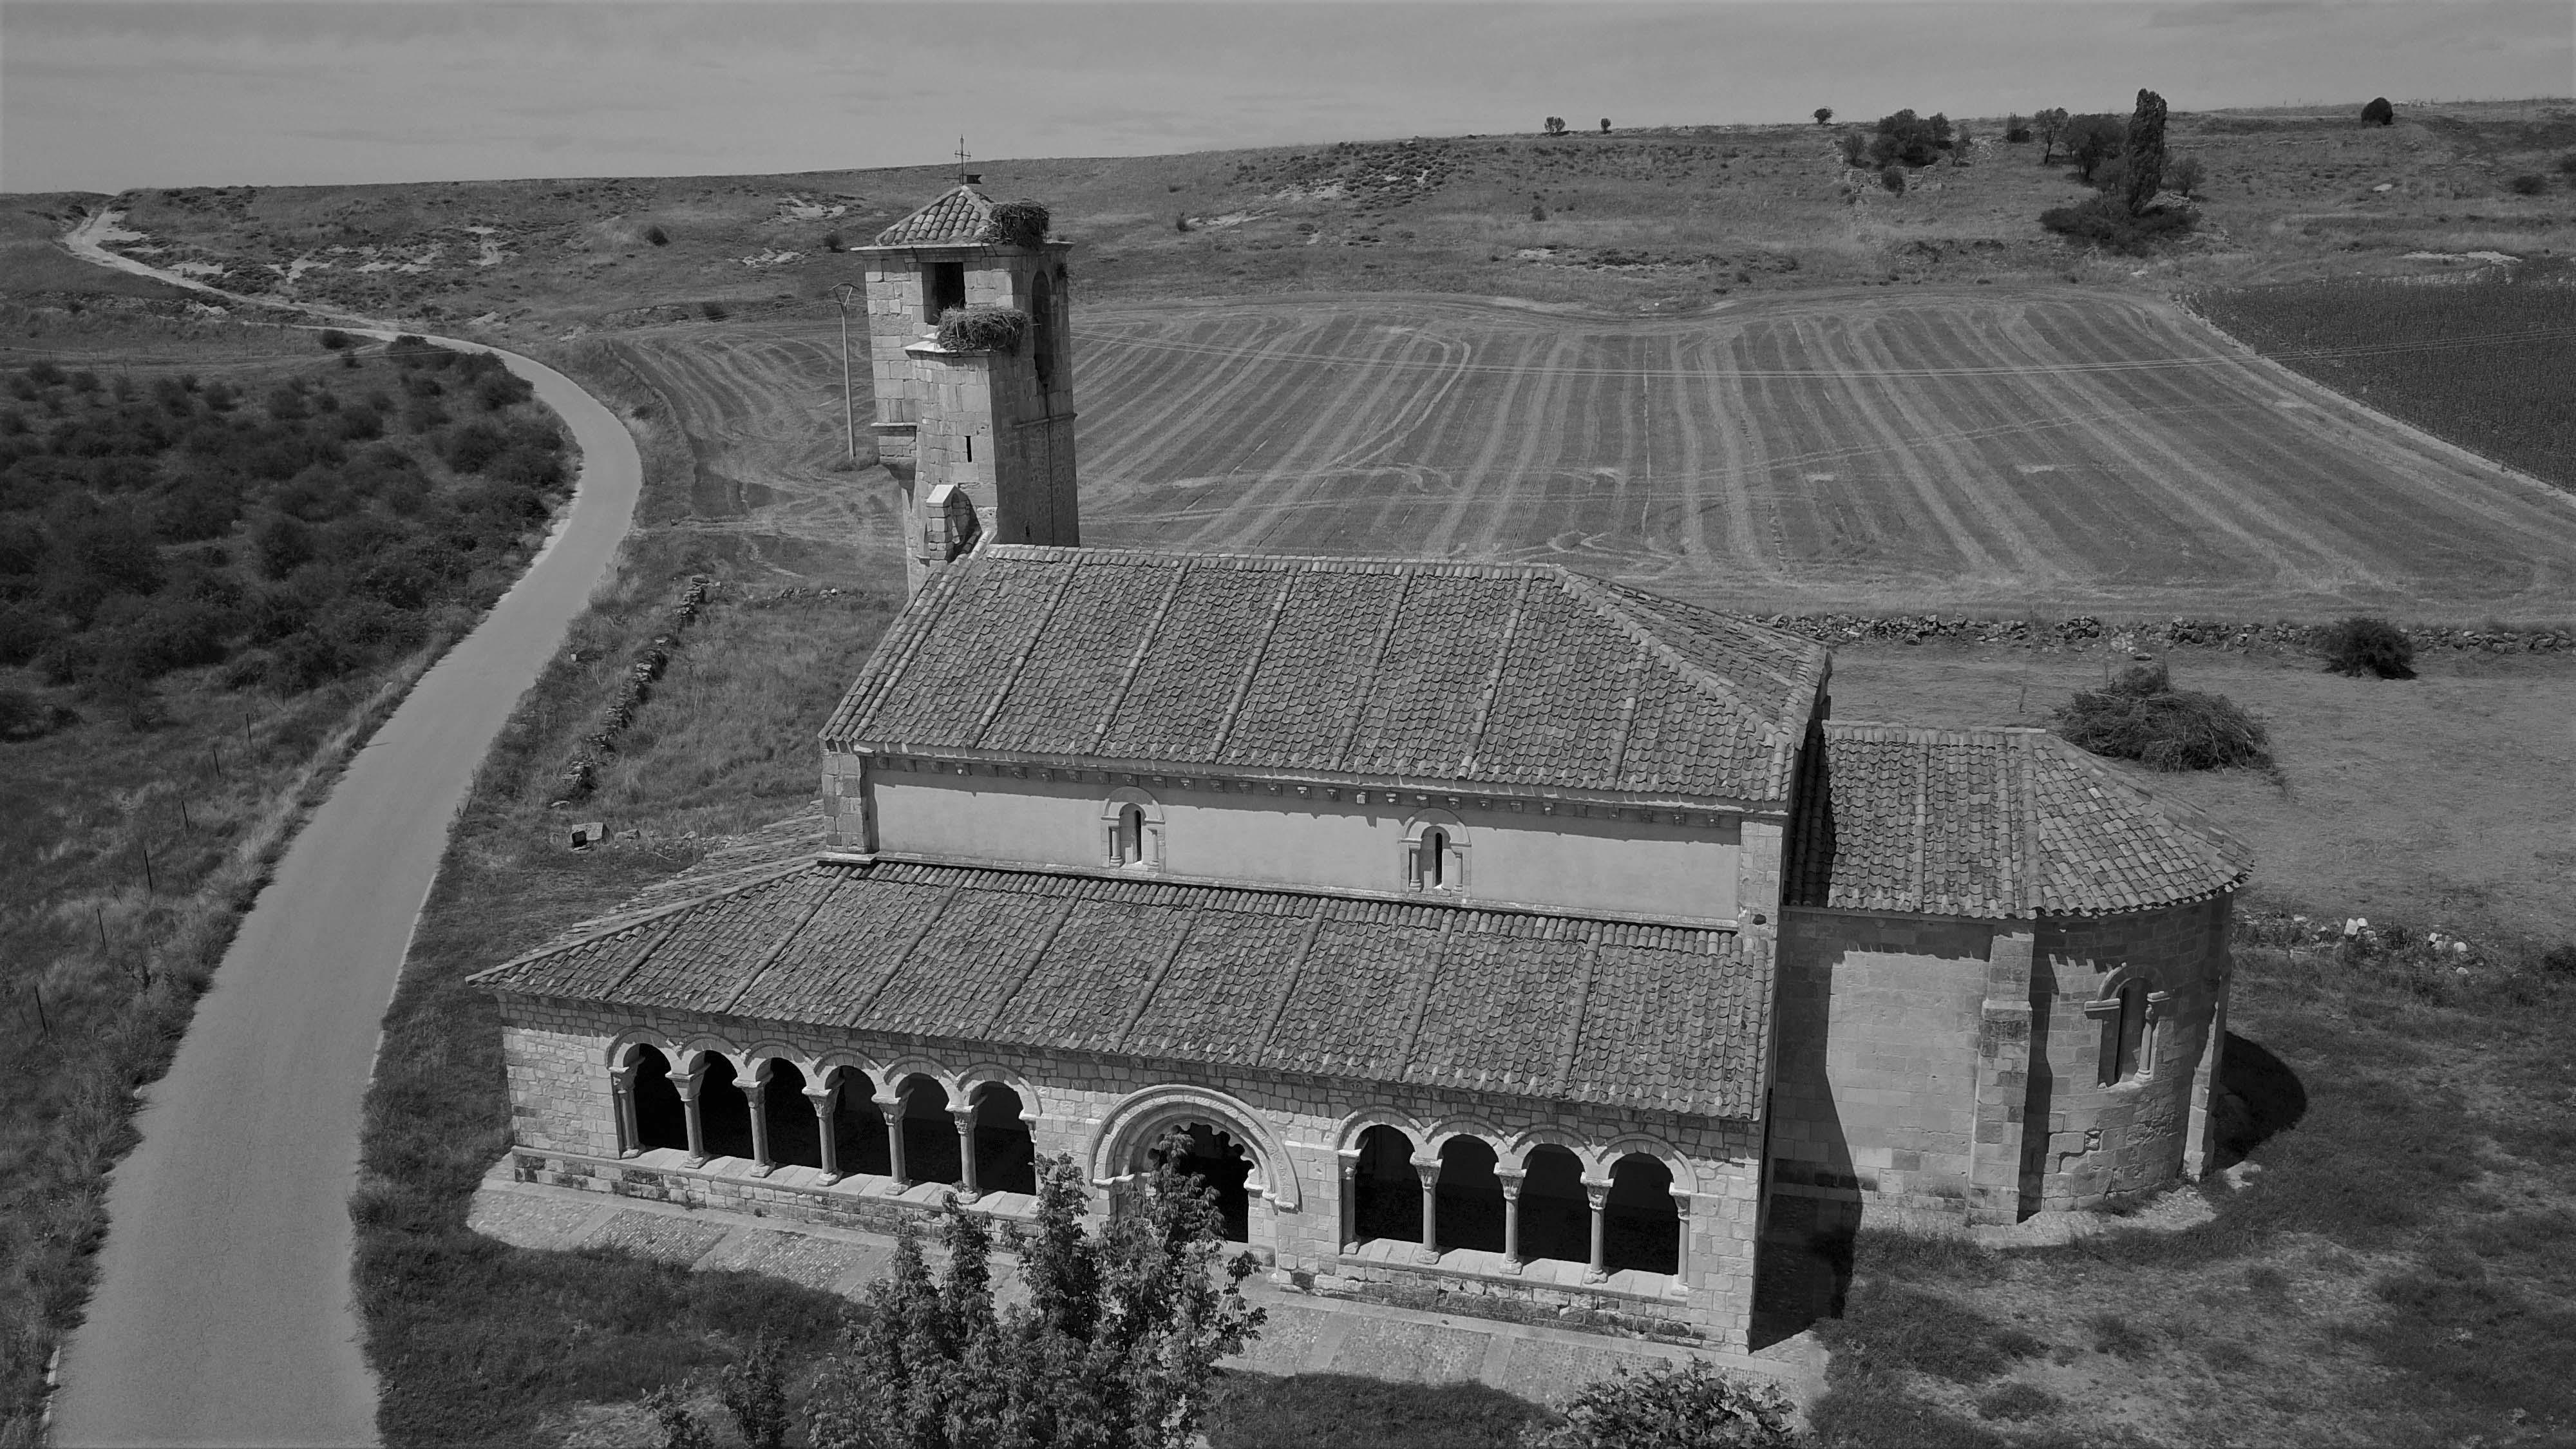 13th century church